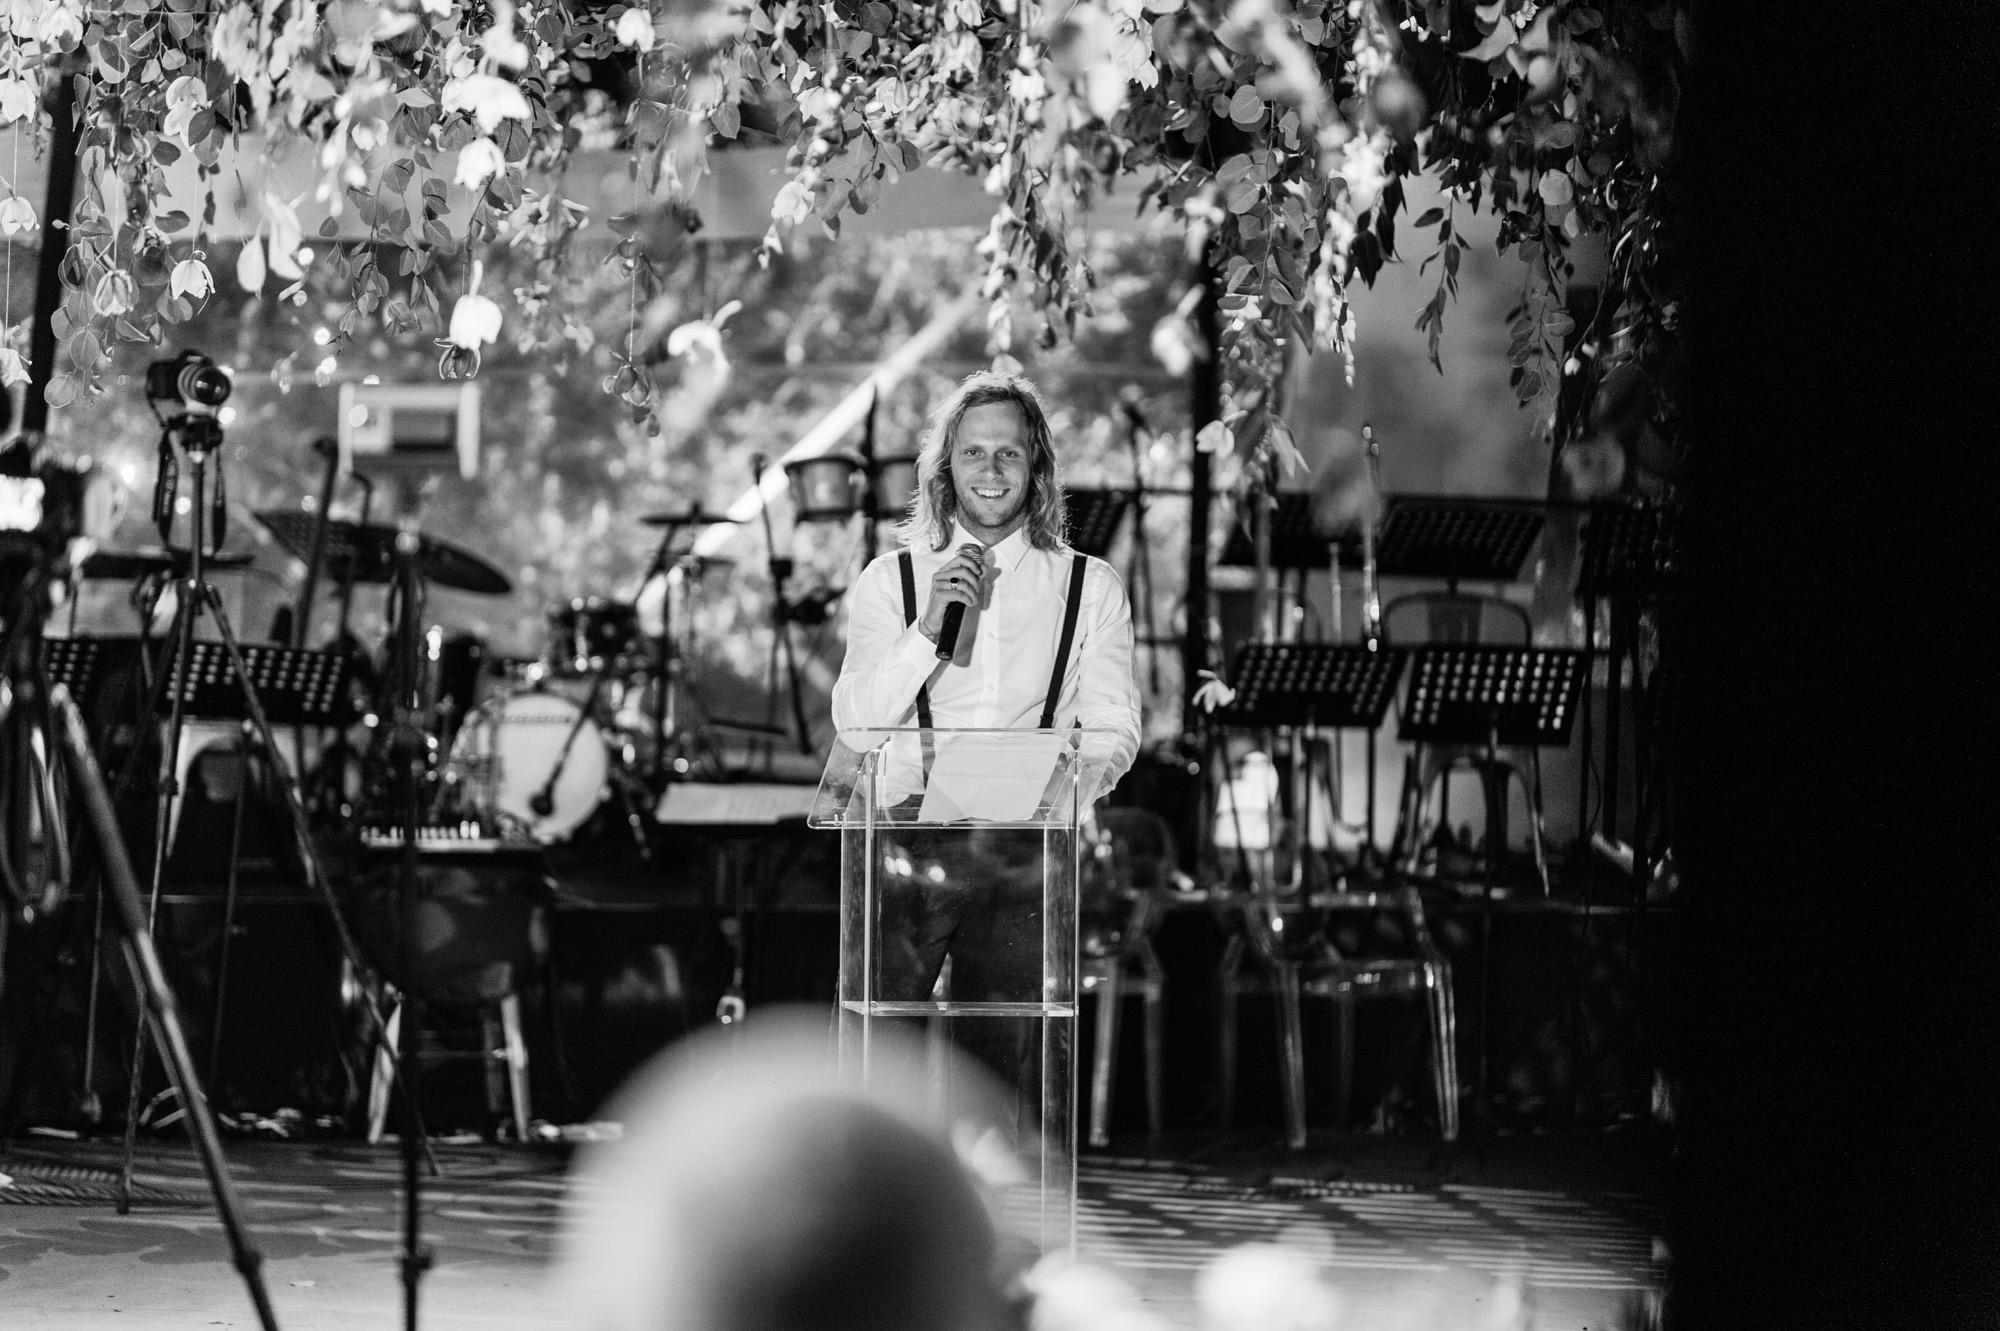 john-henry-wedding-photographer-reception-001-11.JPG